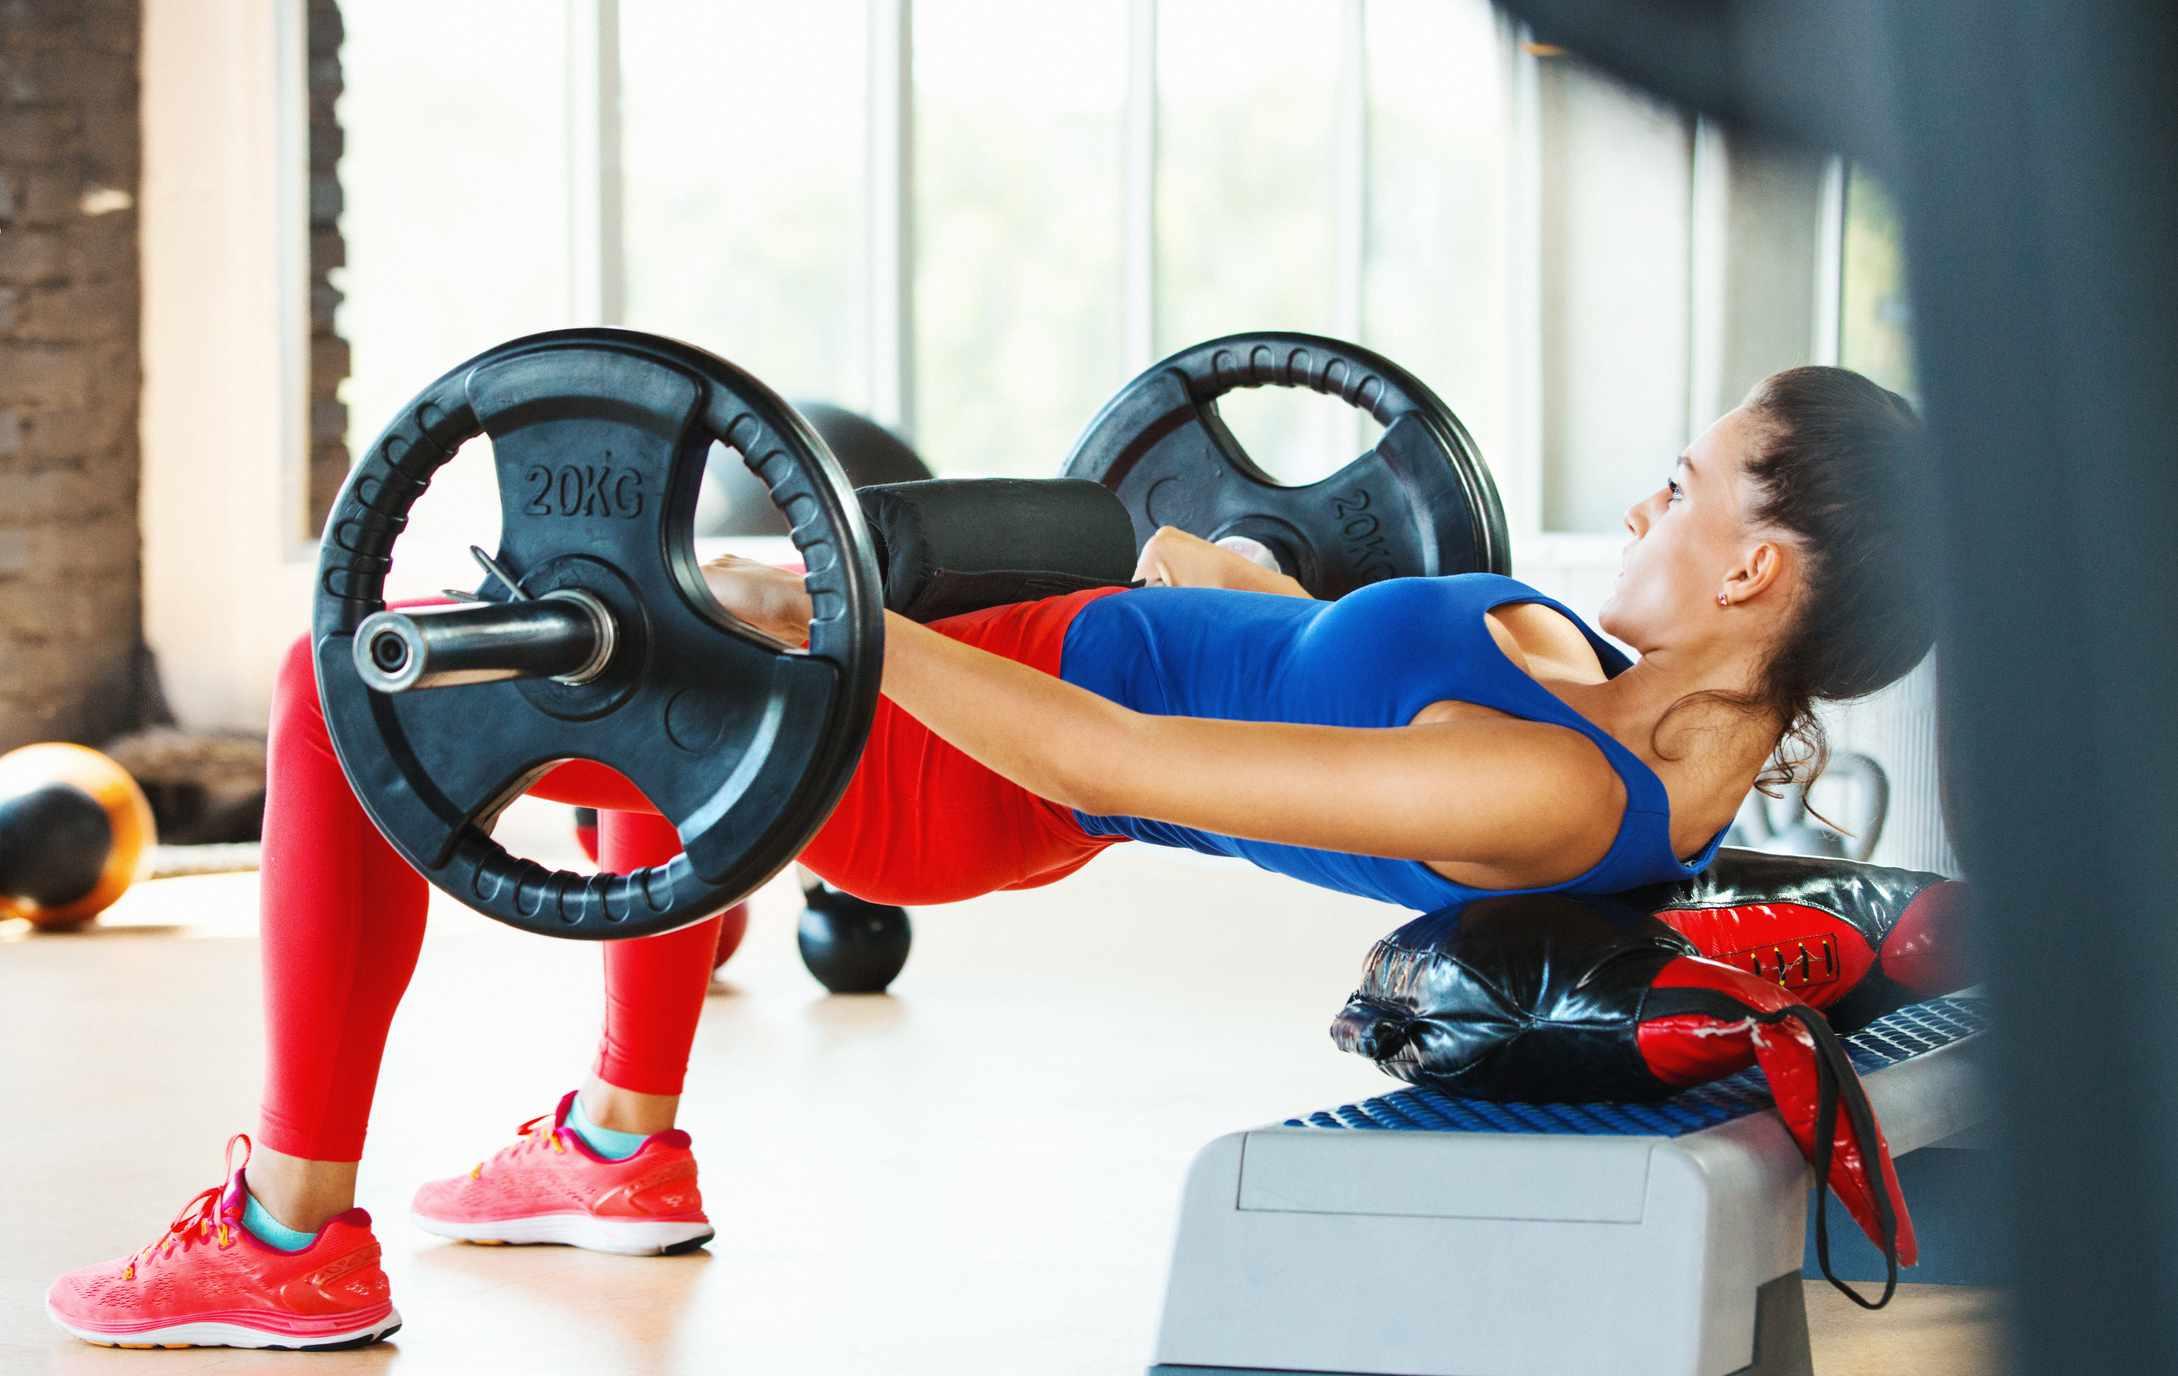 Hip thrust exercise.